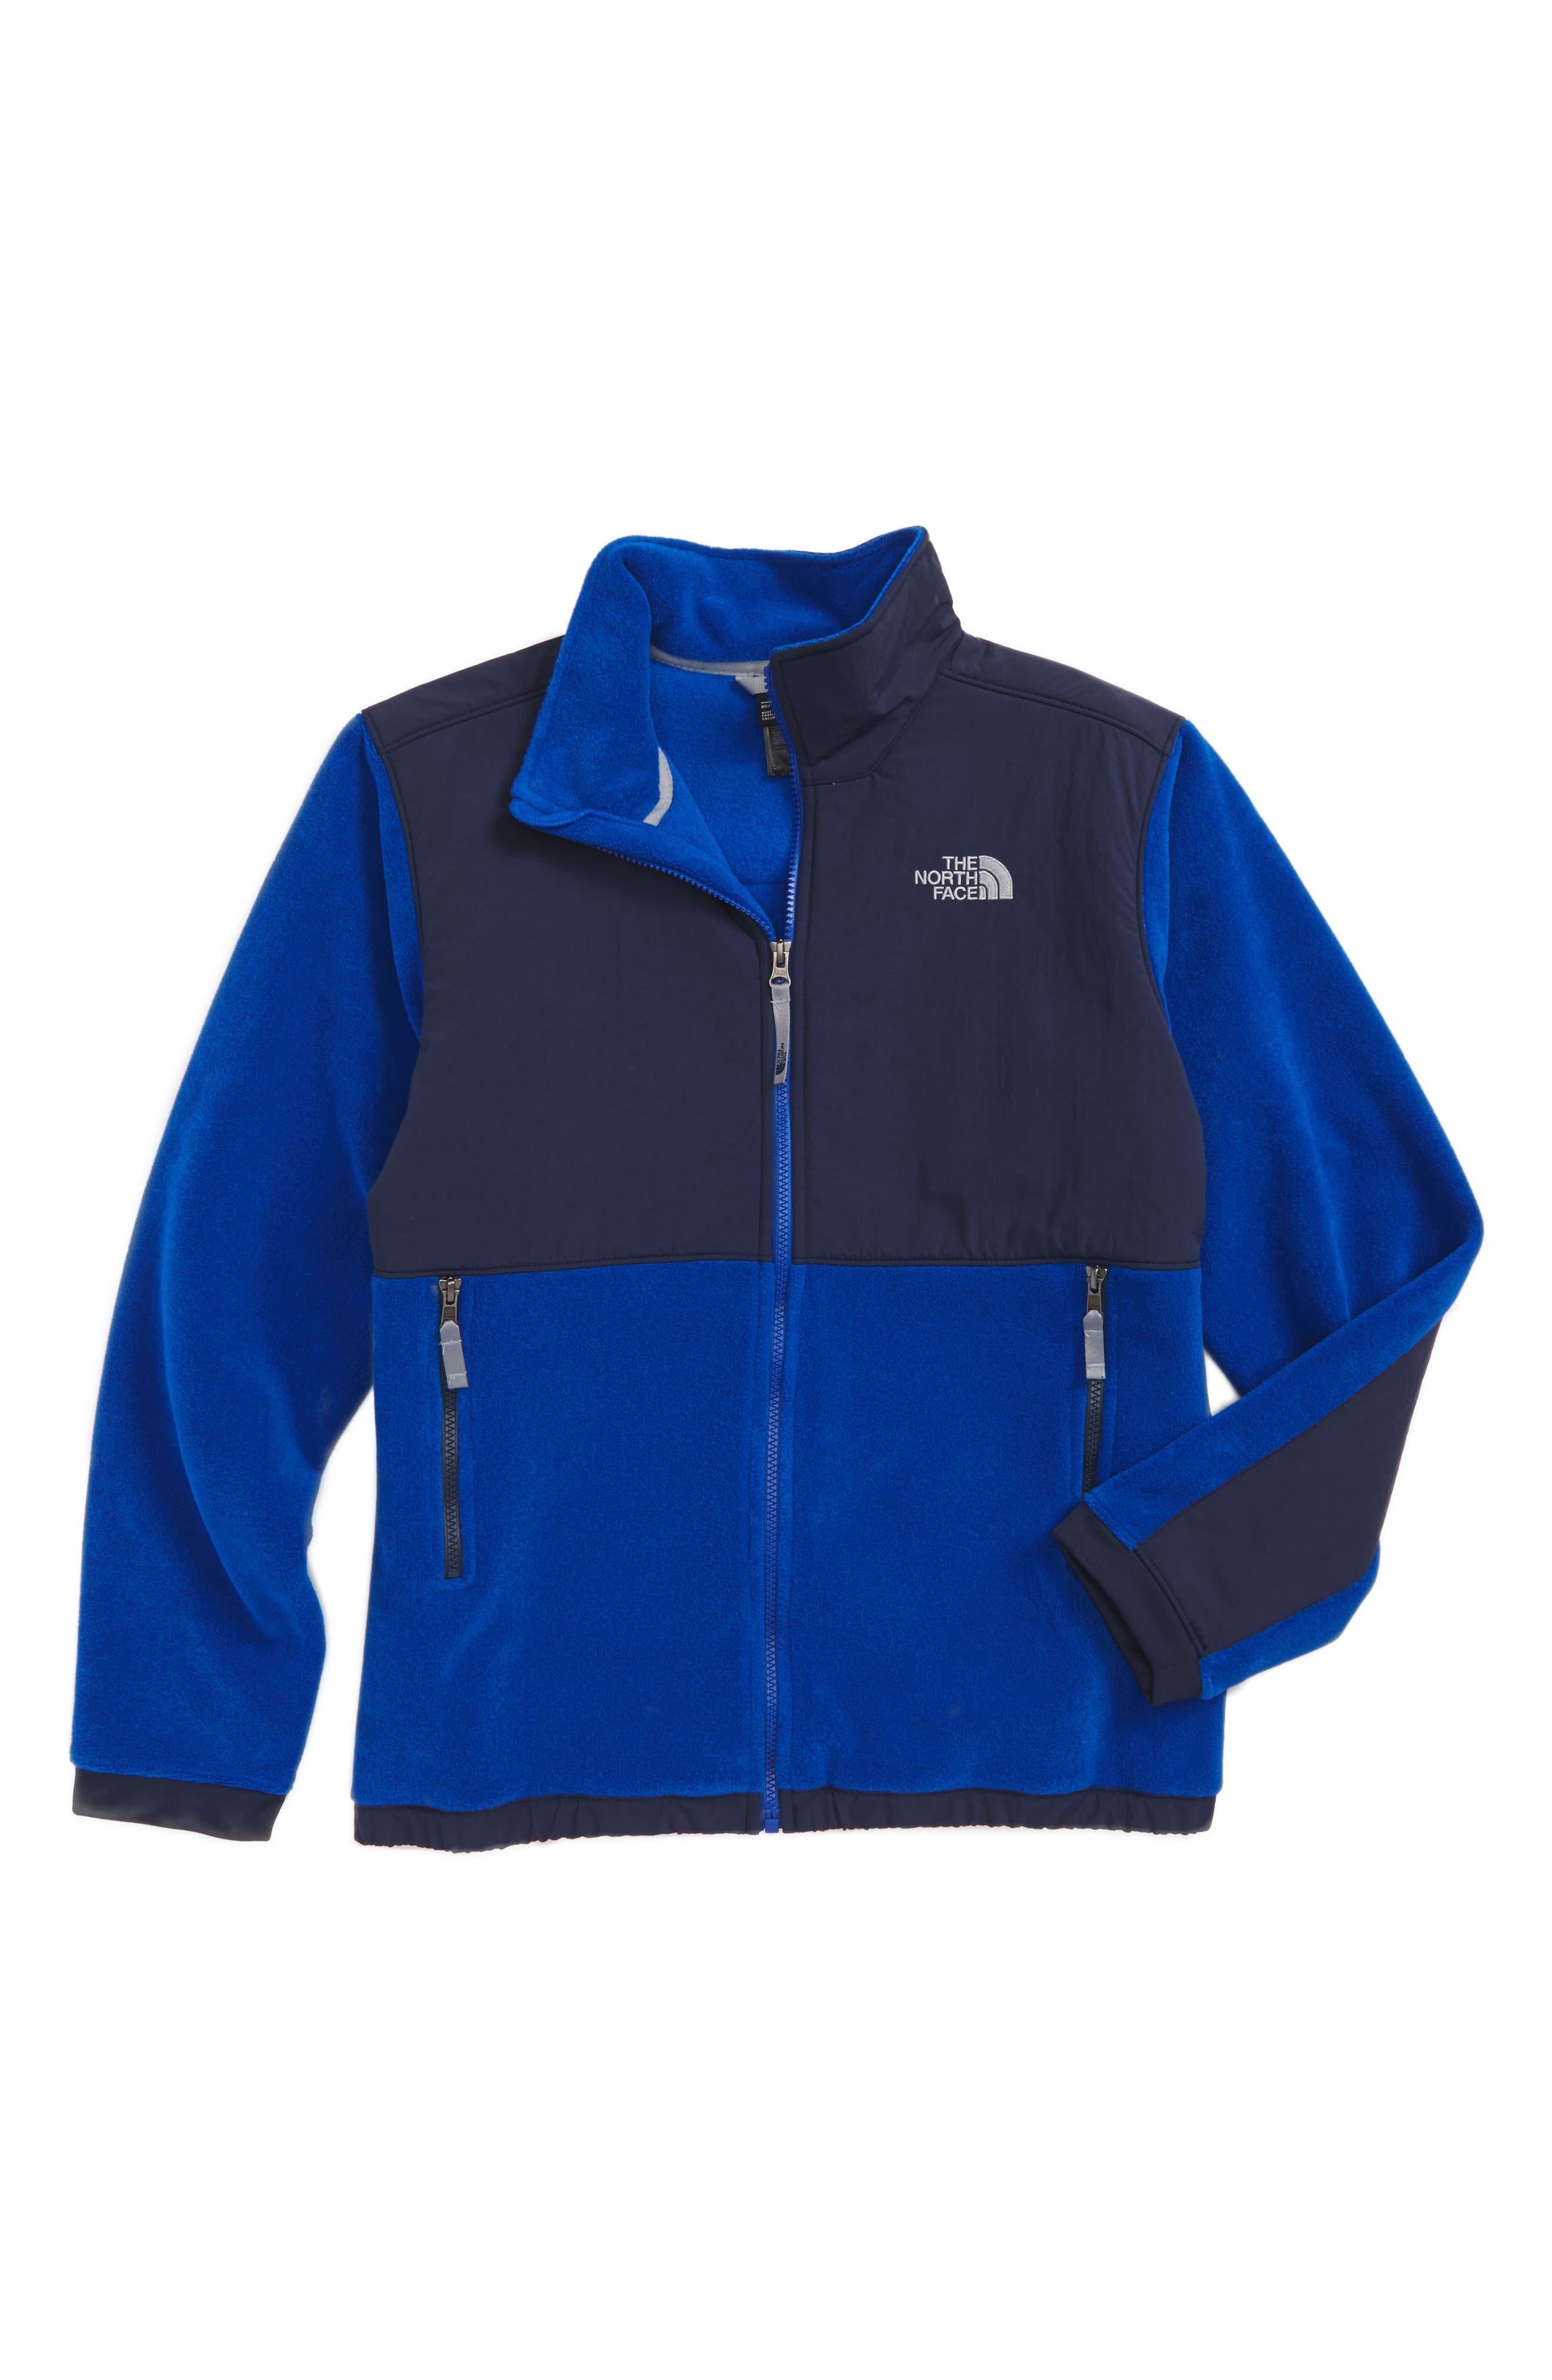 Alternate Image 1 Selected - The North Face 'Denali' Thermal Jacket (Big Boys)